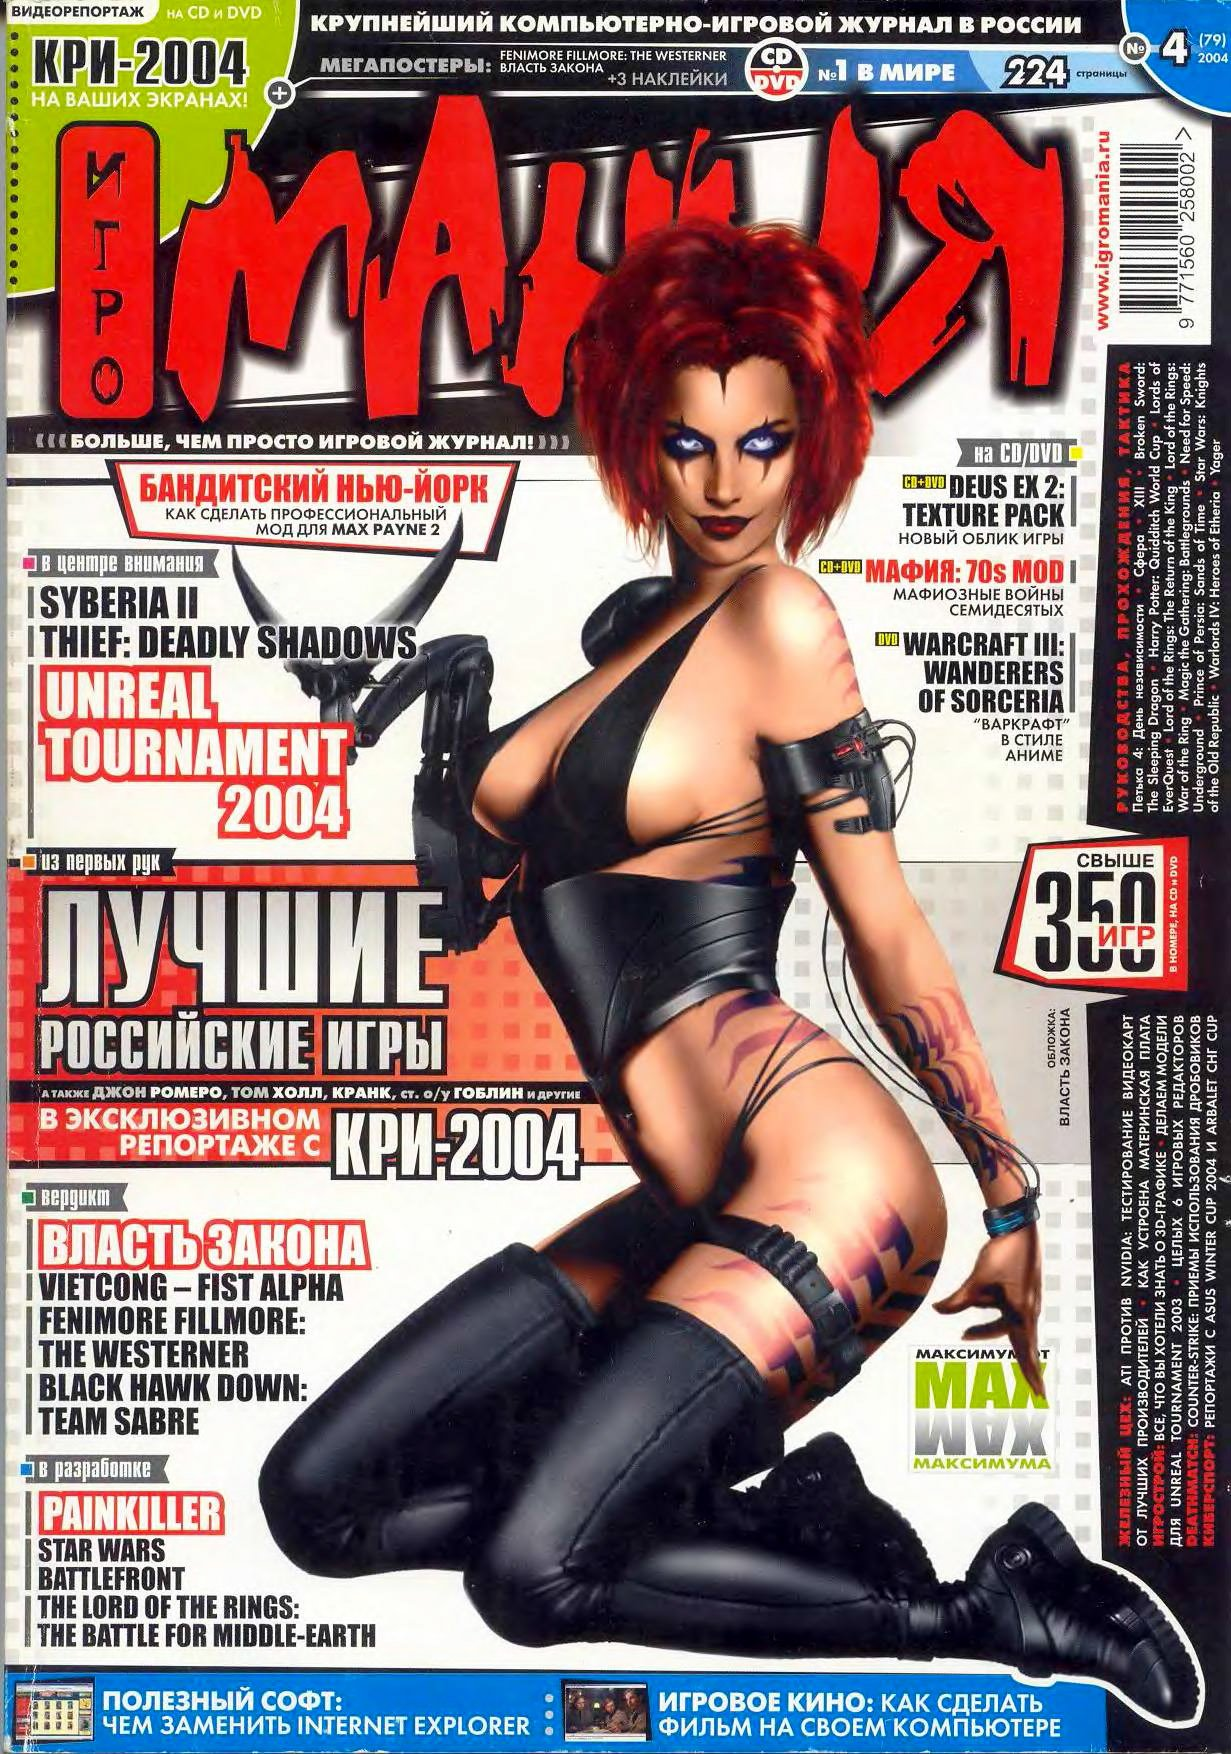 Igromania 079 April 2004